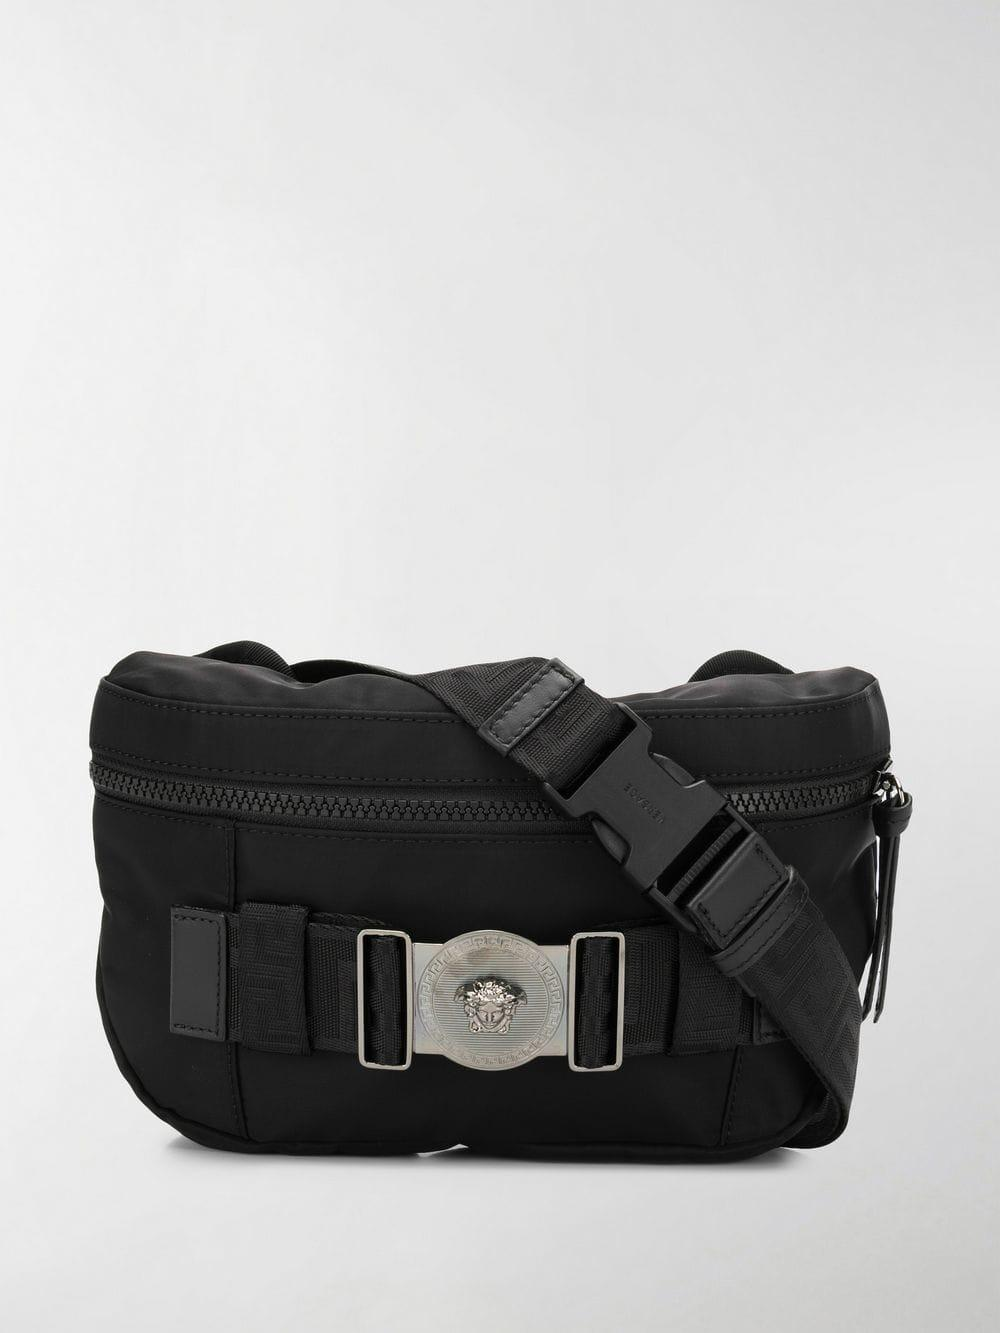 ed8e2b0d7ca6 Lyst - Versace Greca Ribbon Belt Bag in Black for Men